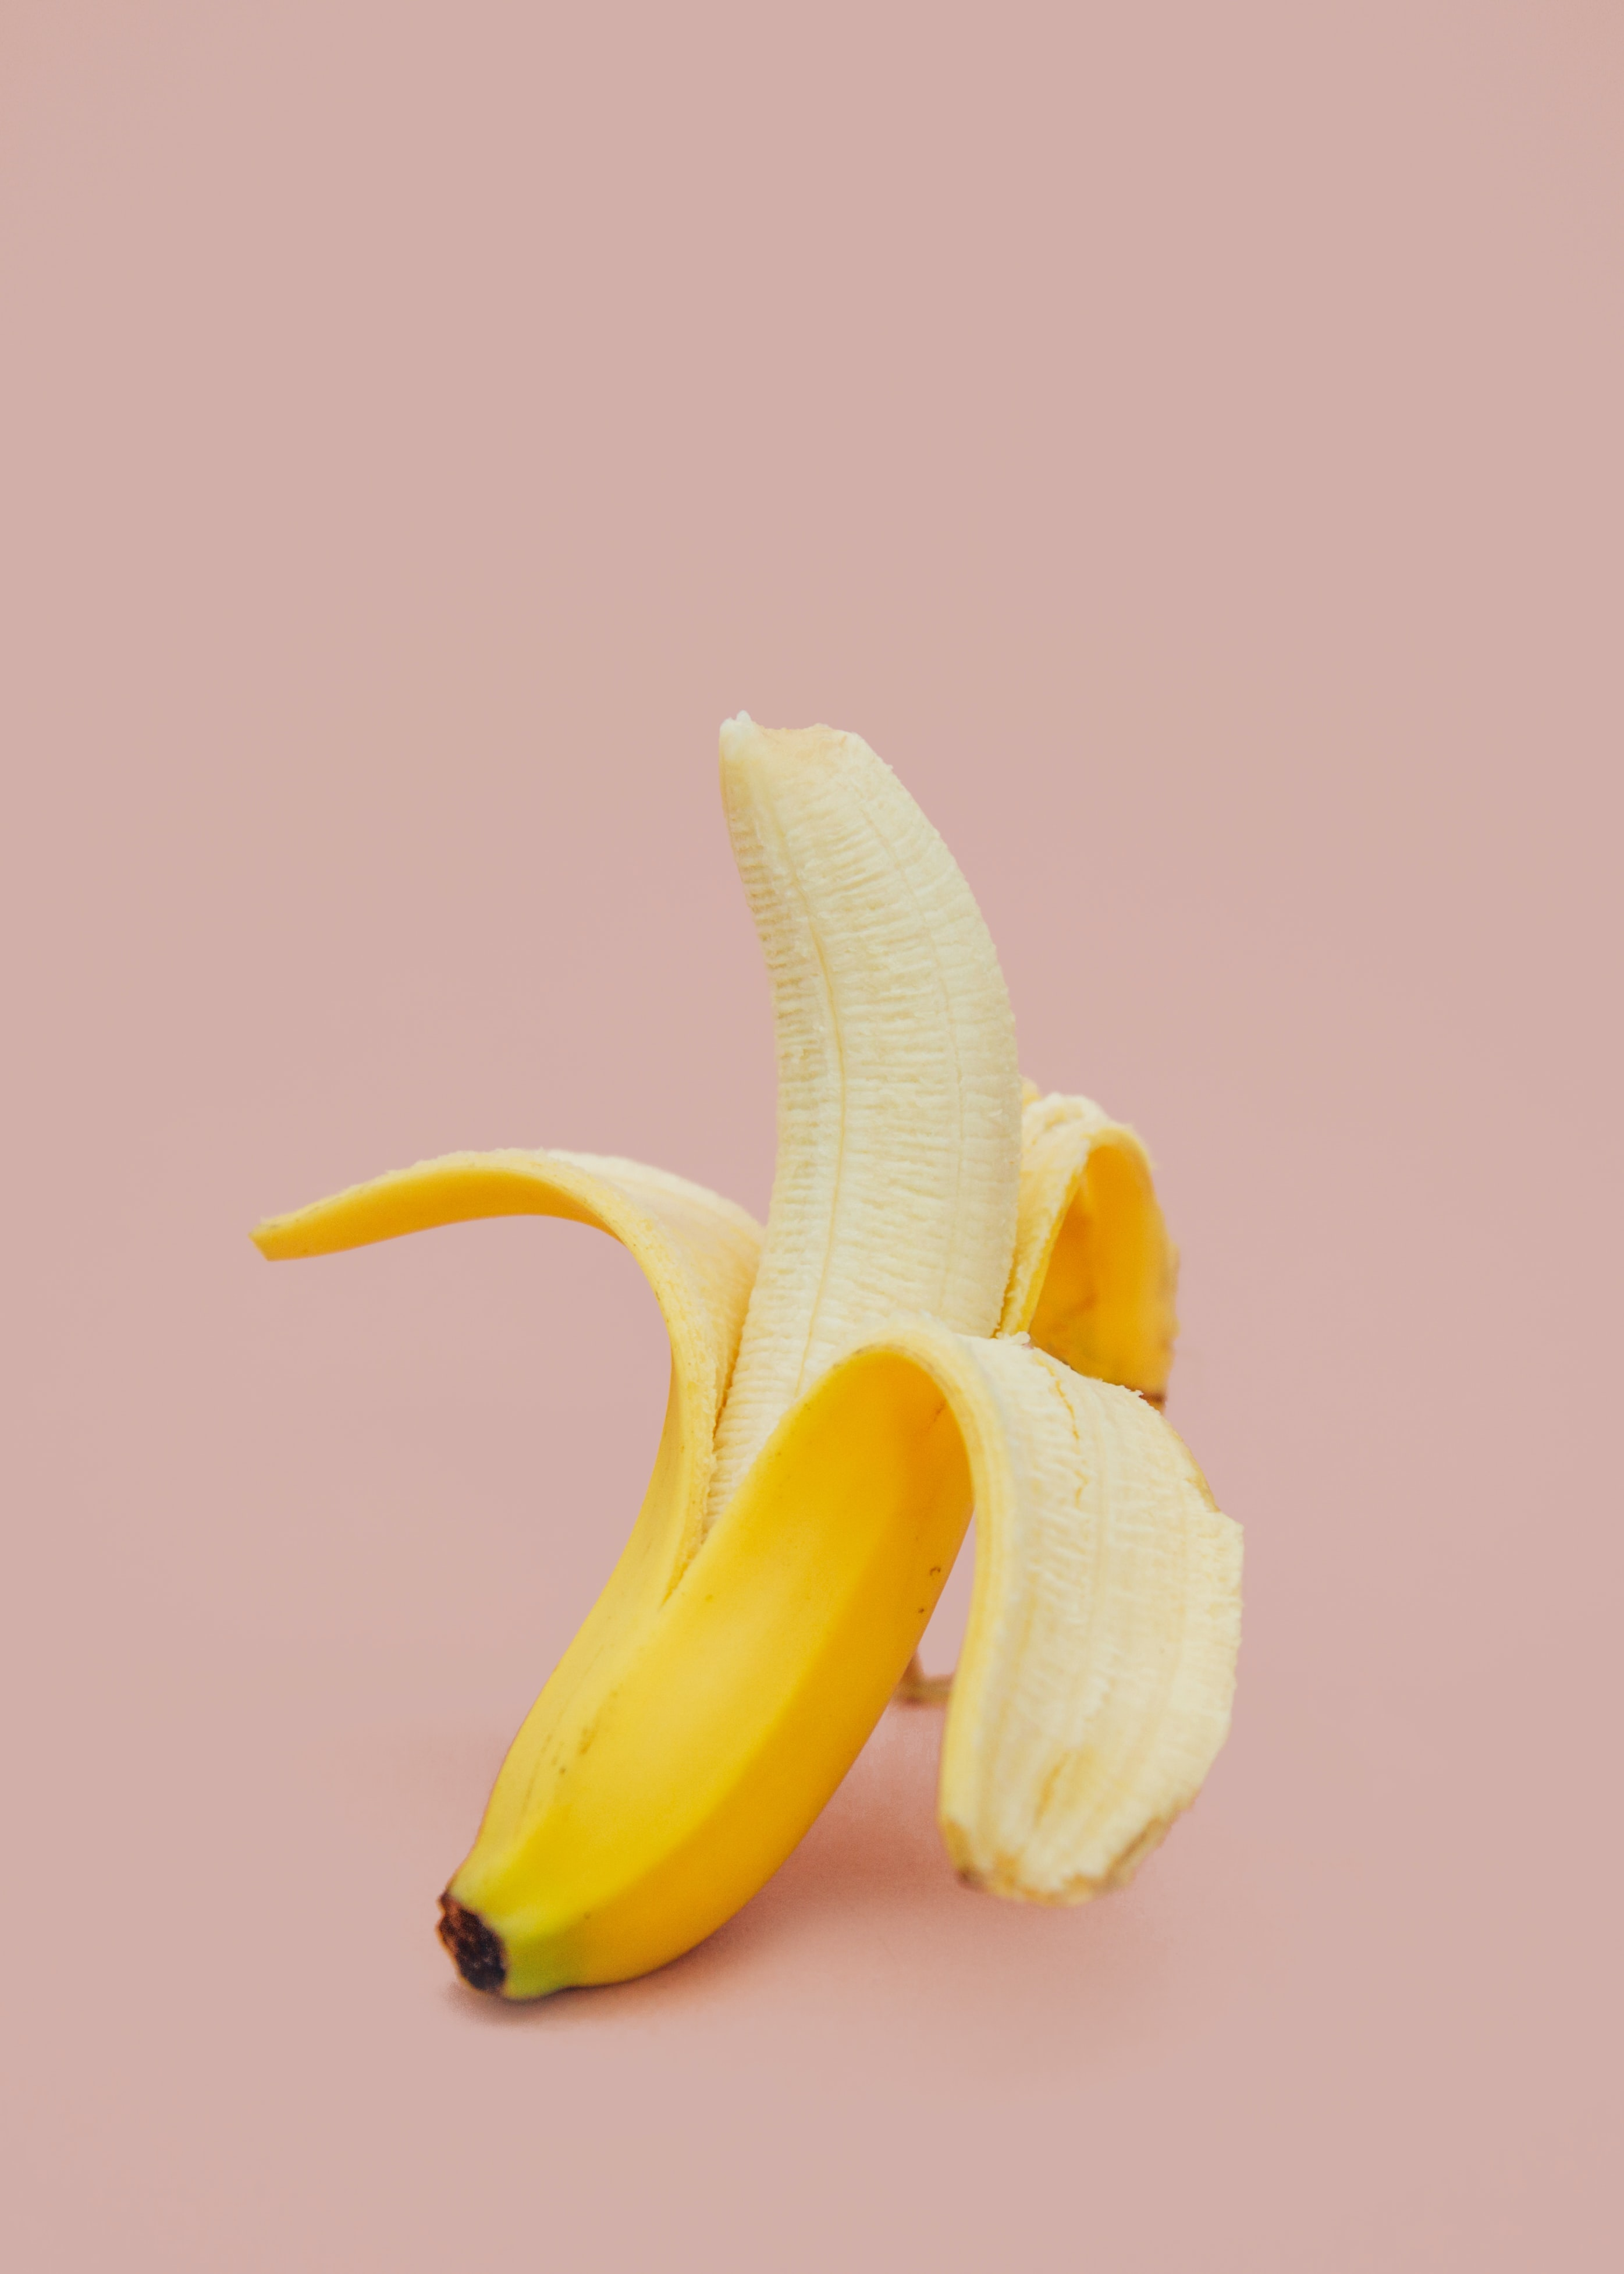 photograph about Banana Printable referred to as 27+ Banana Visuals Obtain Free of charge Shots upon Unsplash